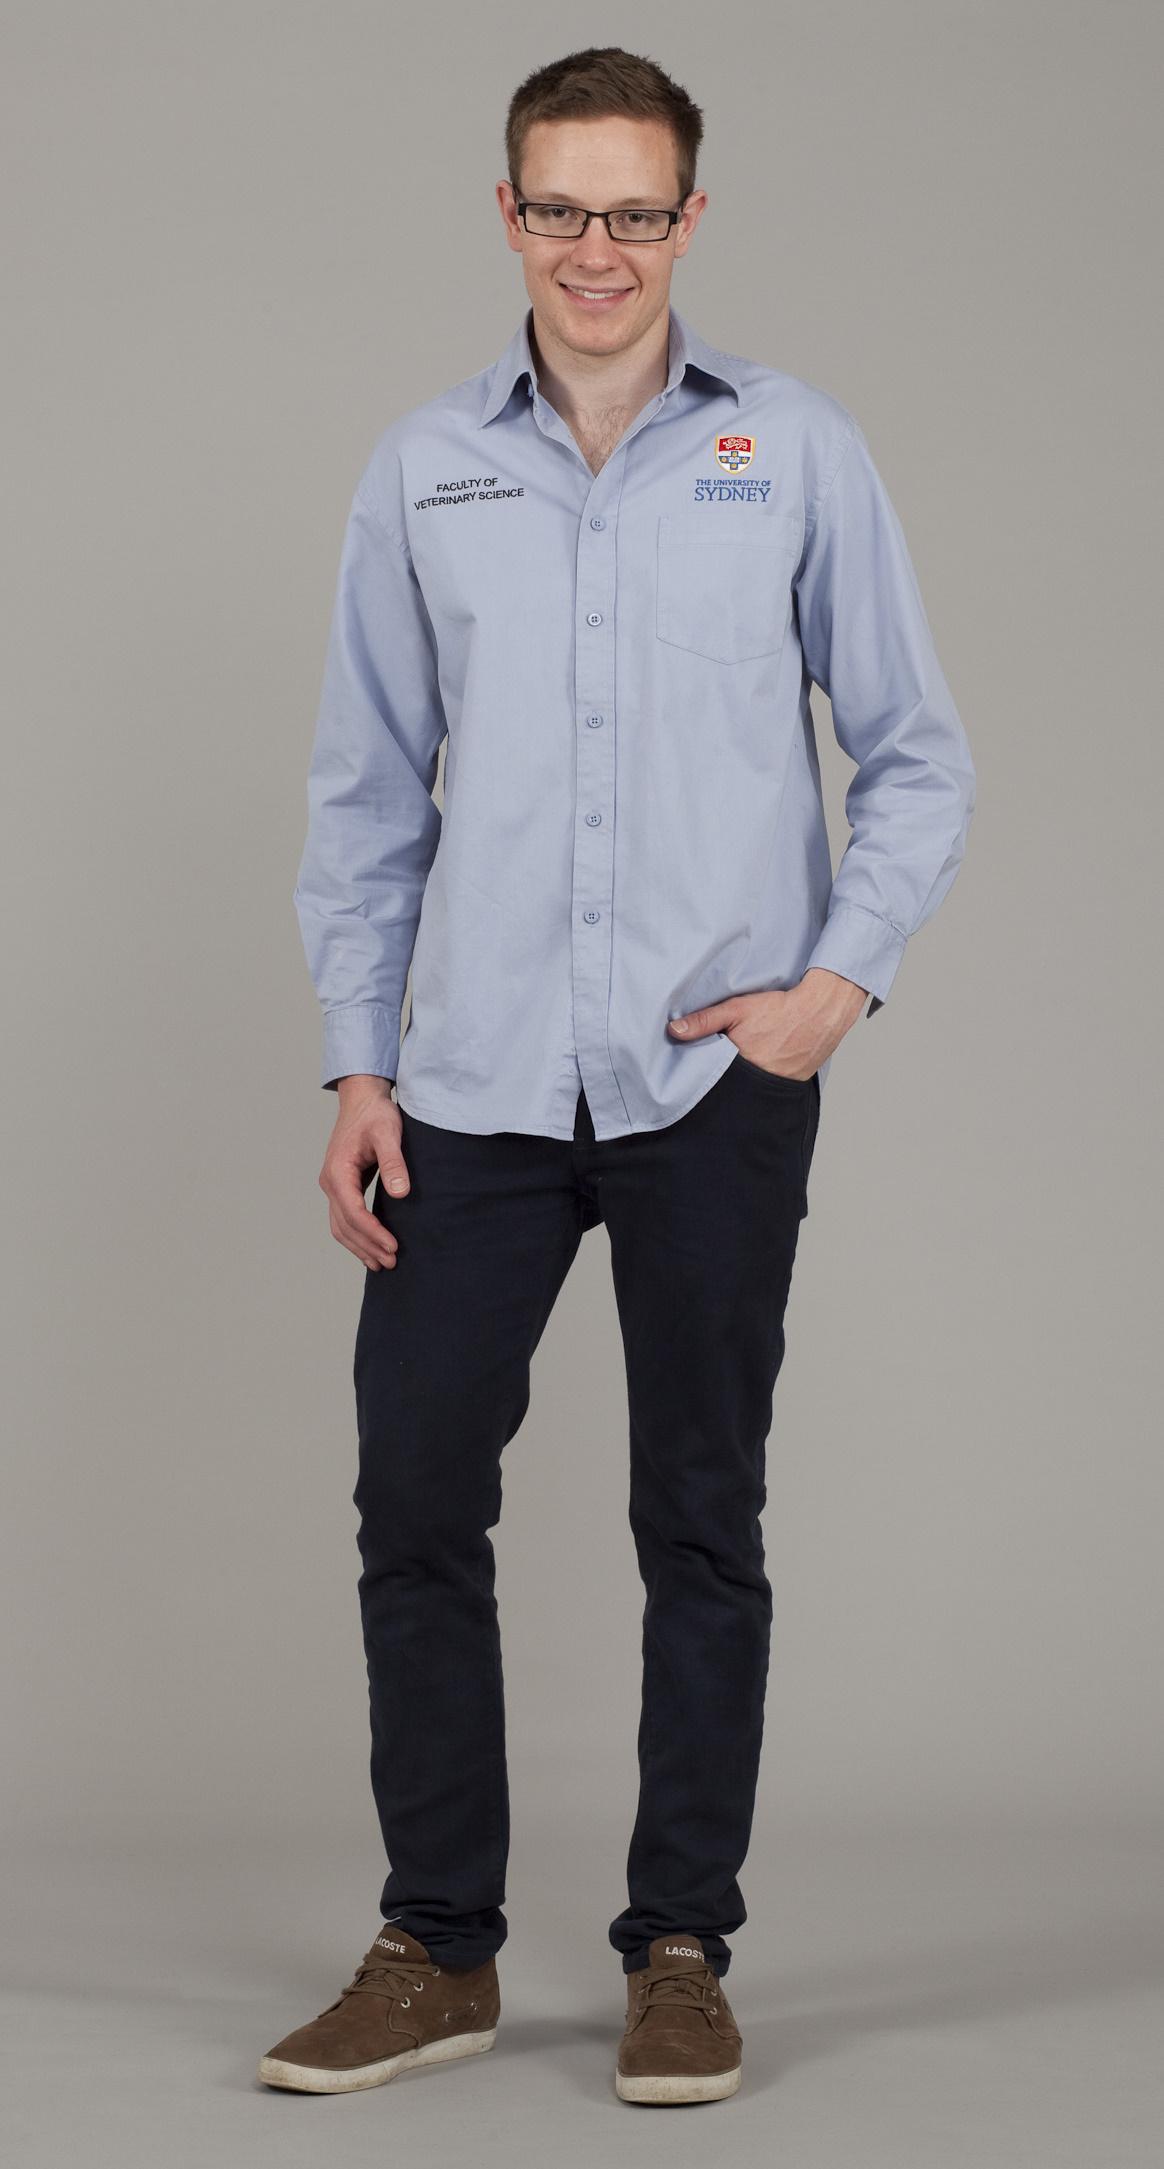 Mens Polo Shirt With Pocket